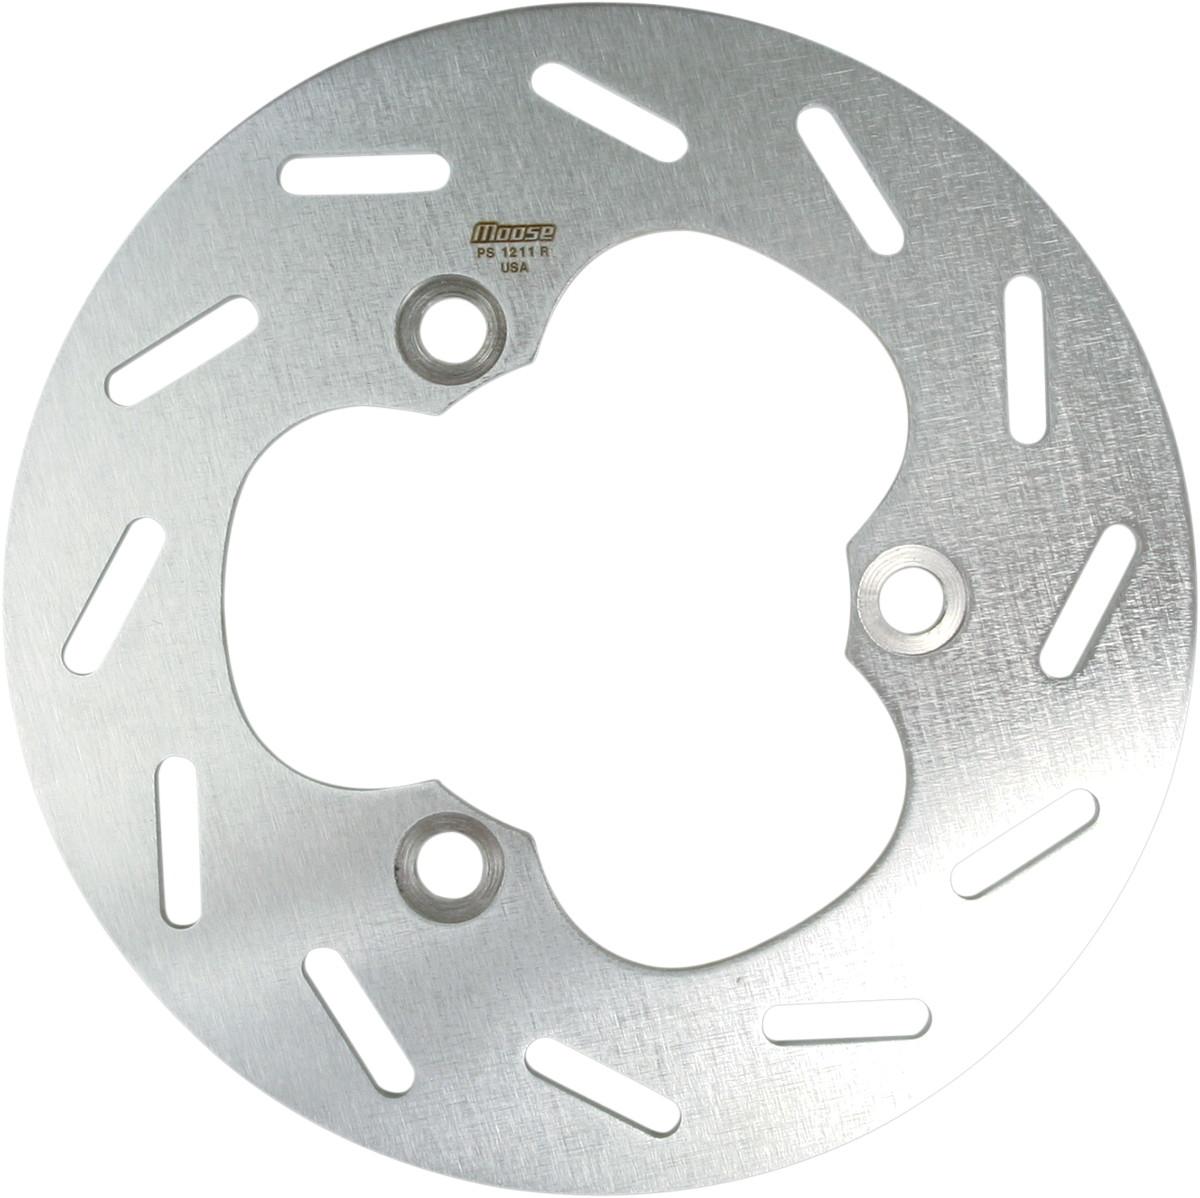 【MOOSE RACING】維修用煞車碟盤 [1711-0226] - 「Webike-摩托百貨」